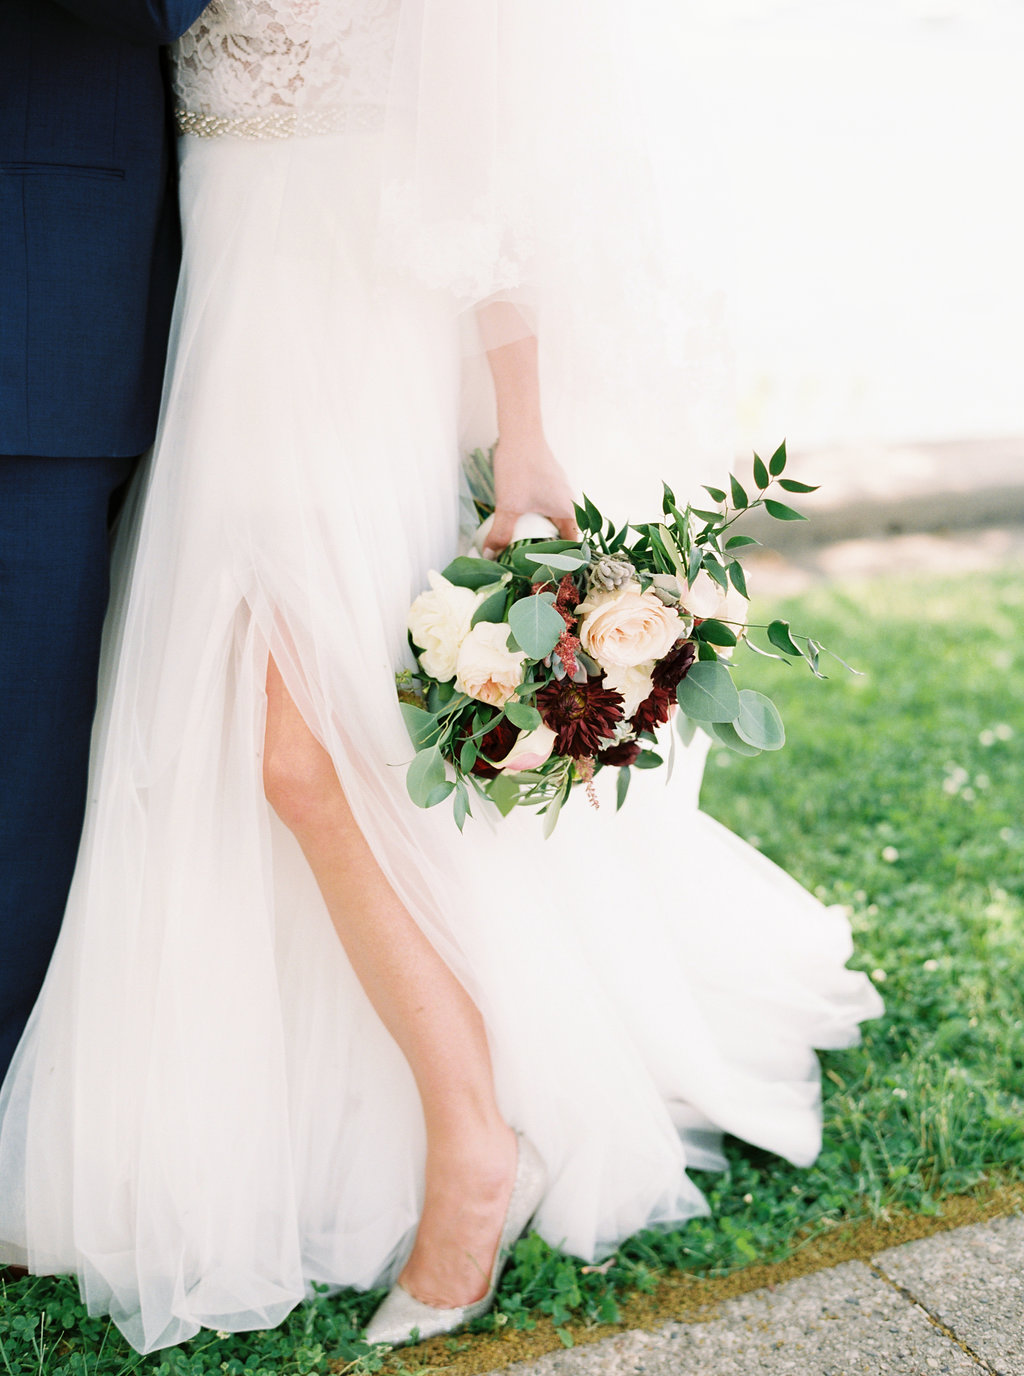 nicoleclarey_stacey+alexwedding_bride+groom-128.jpg